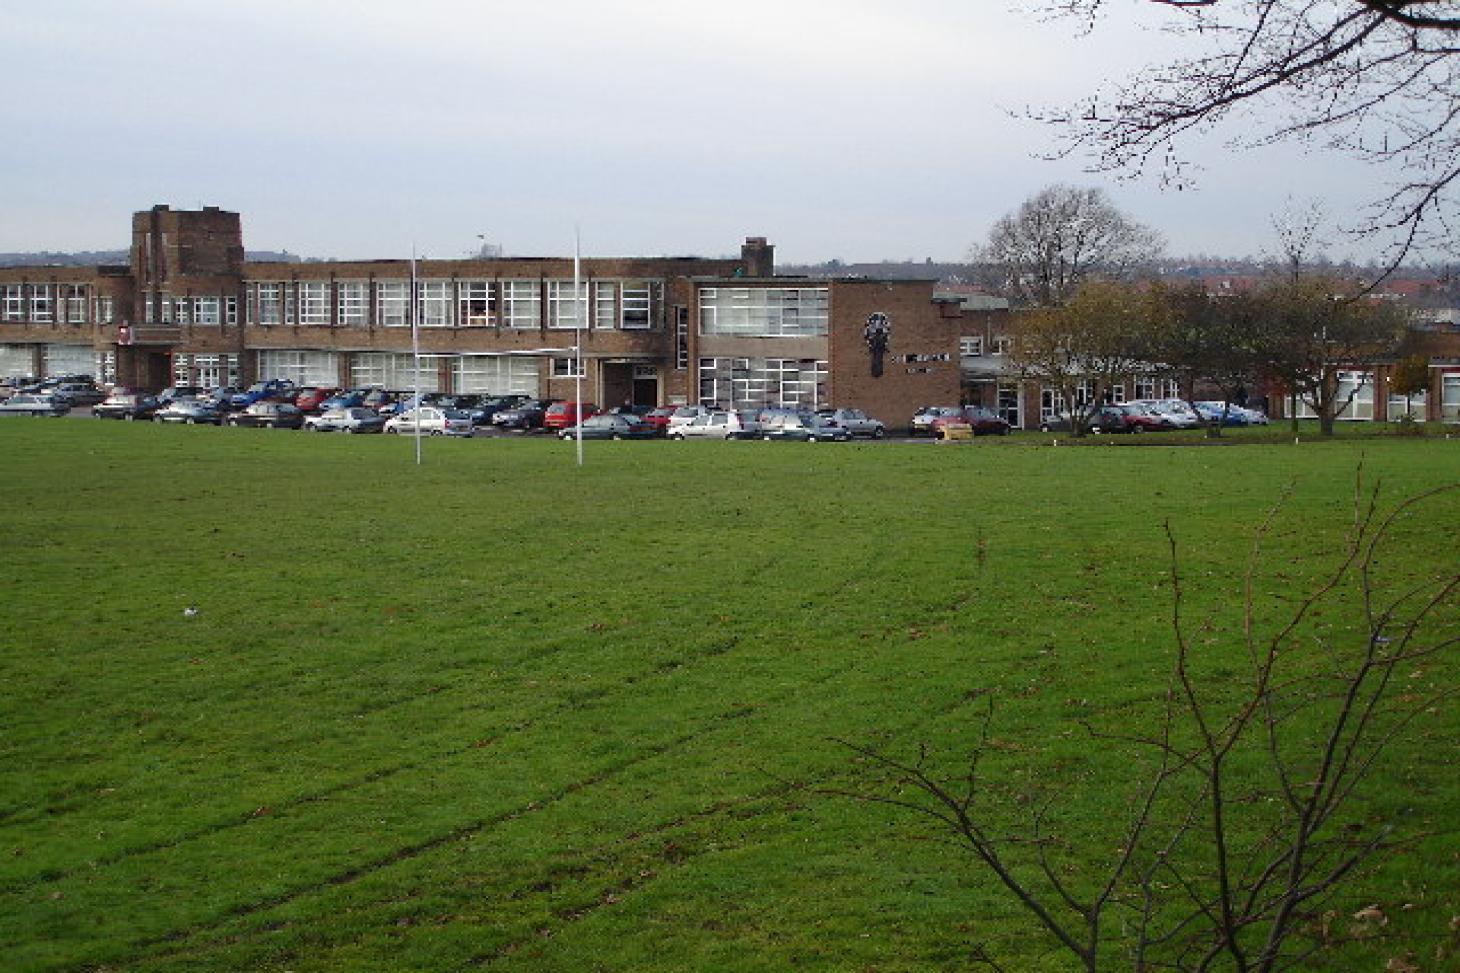 Thomas Moore Catholic School 5 a side | Grass football pitch